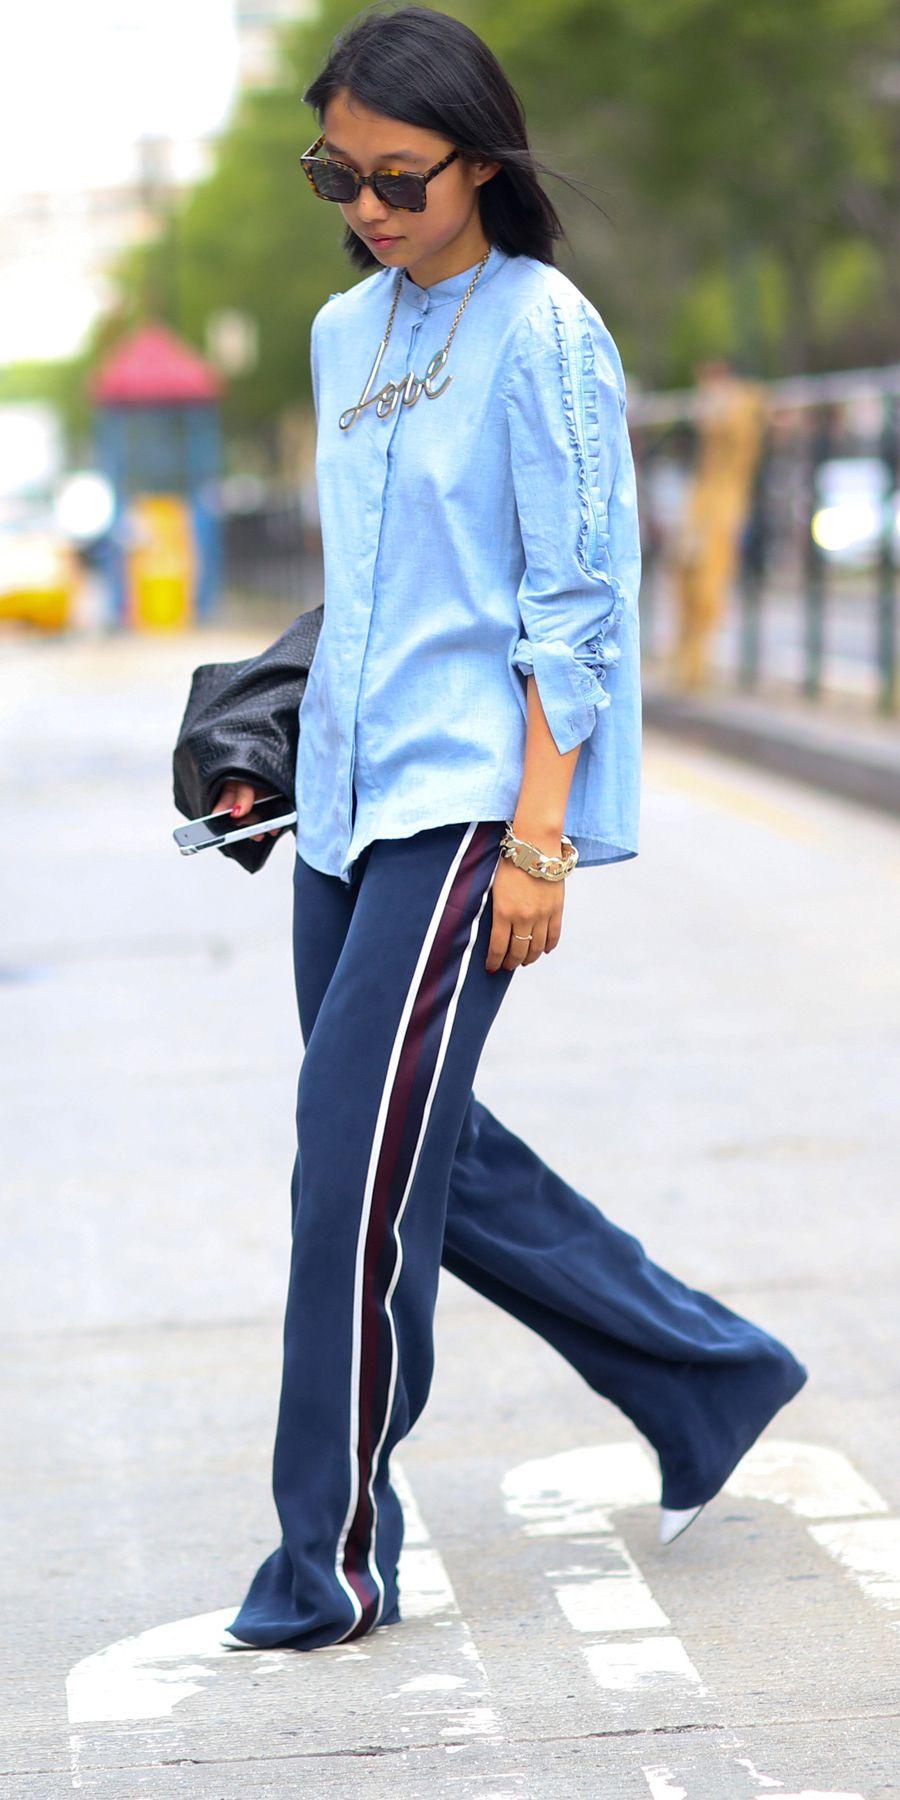 Margaret Zhang #NYFW Spring 2015 Street Style